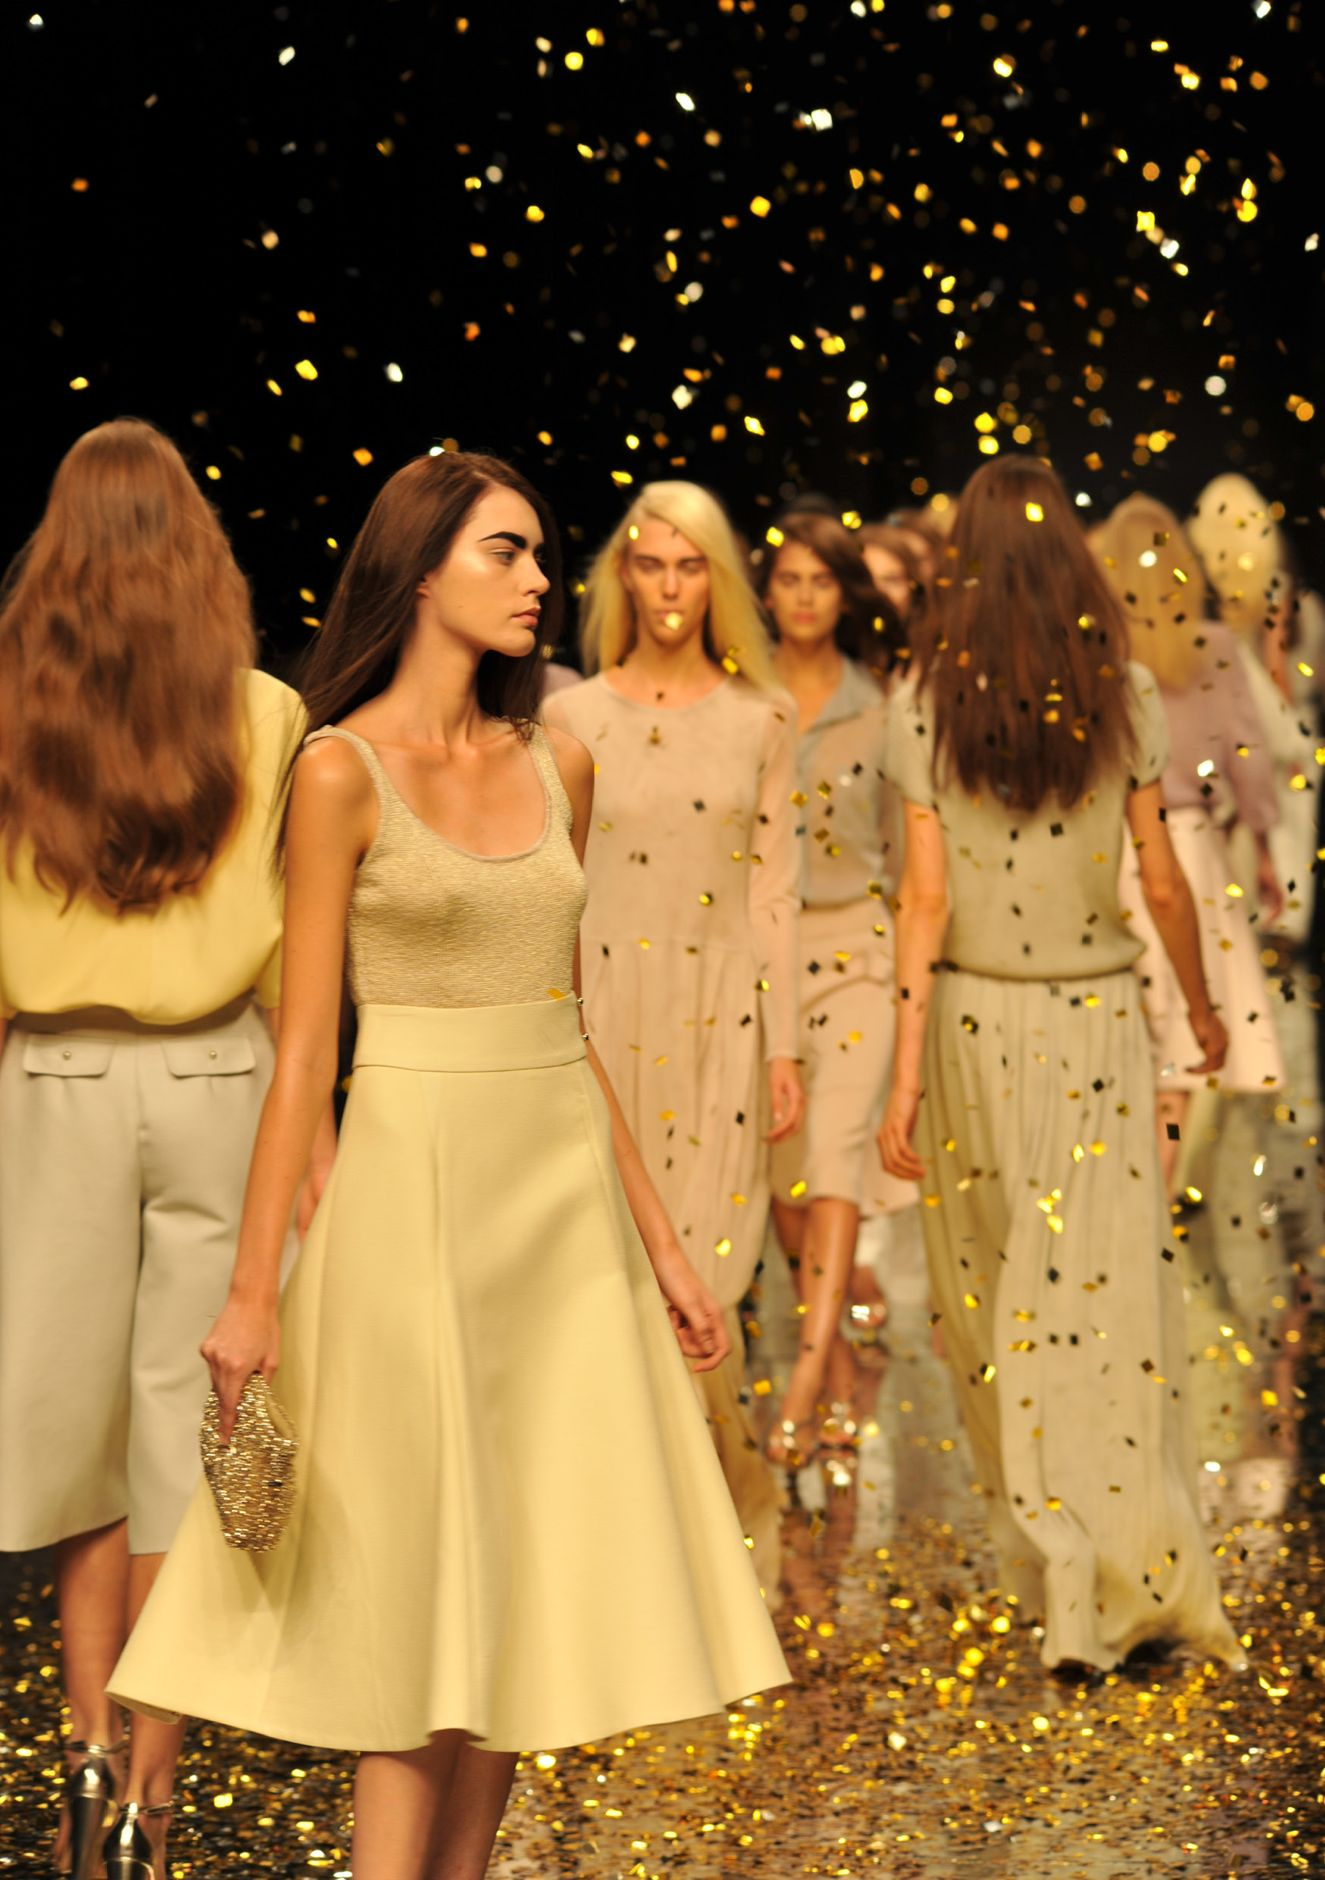 Anteprima Catwalk Finale Milano Fashion Week